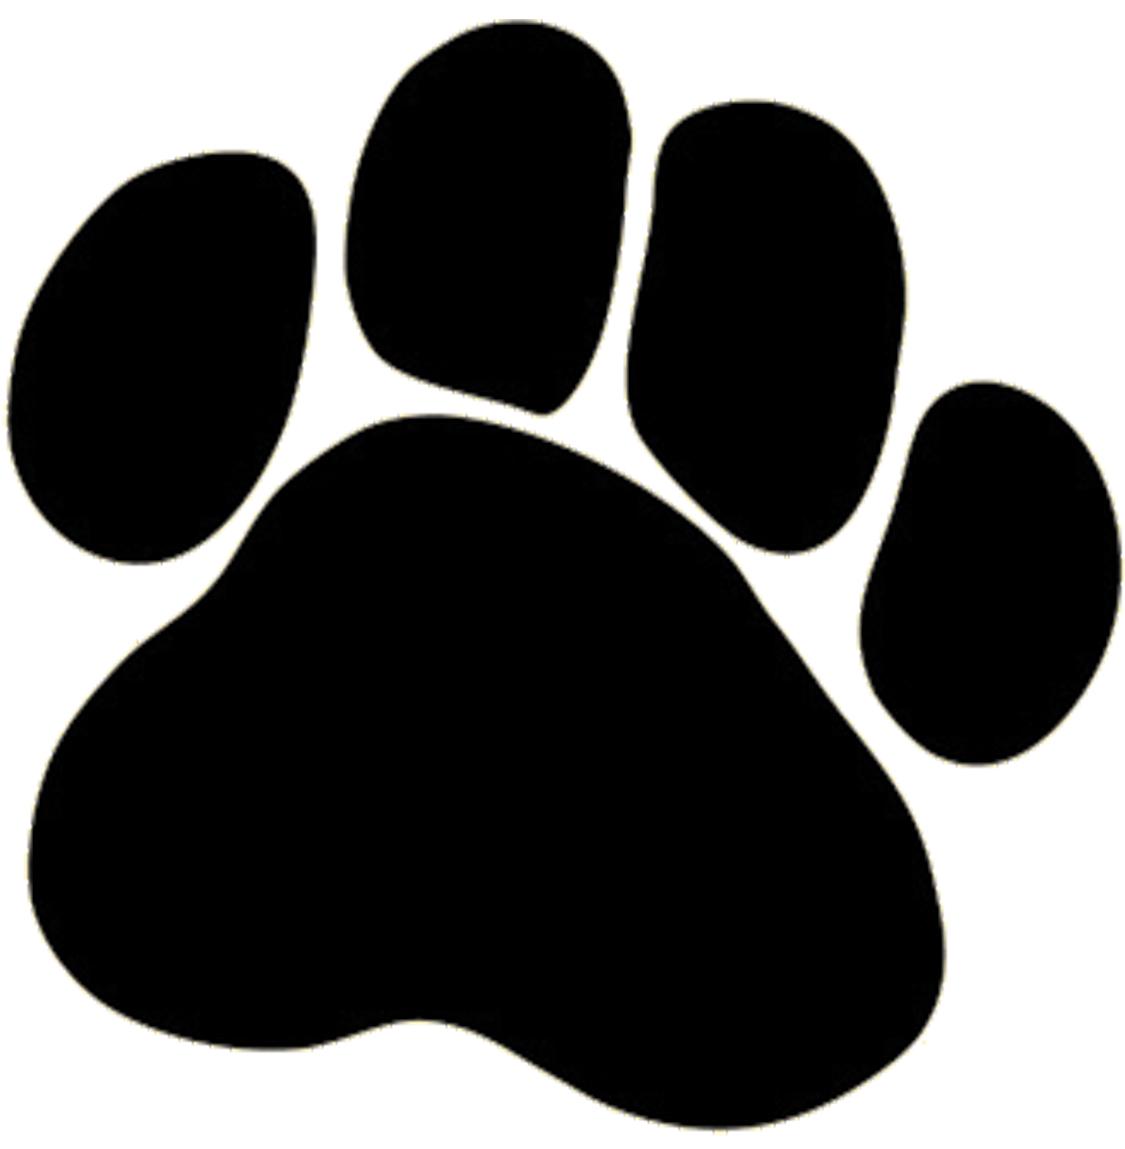 Dog paw print clip art